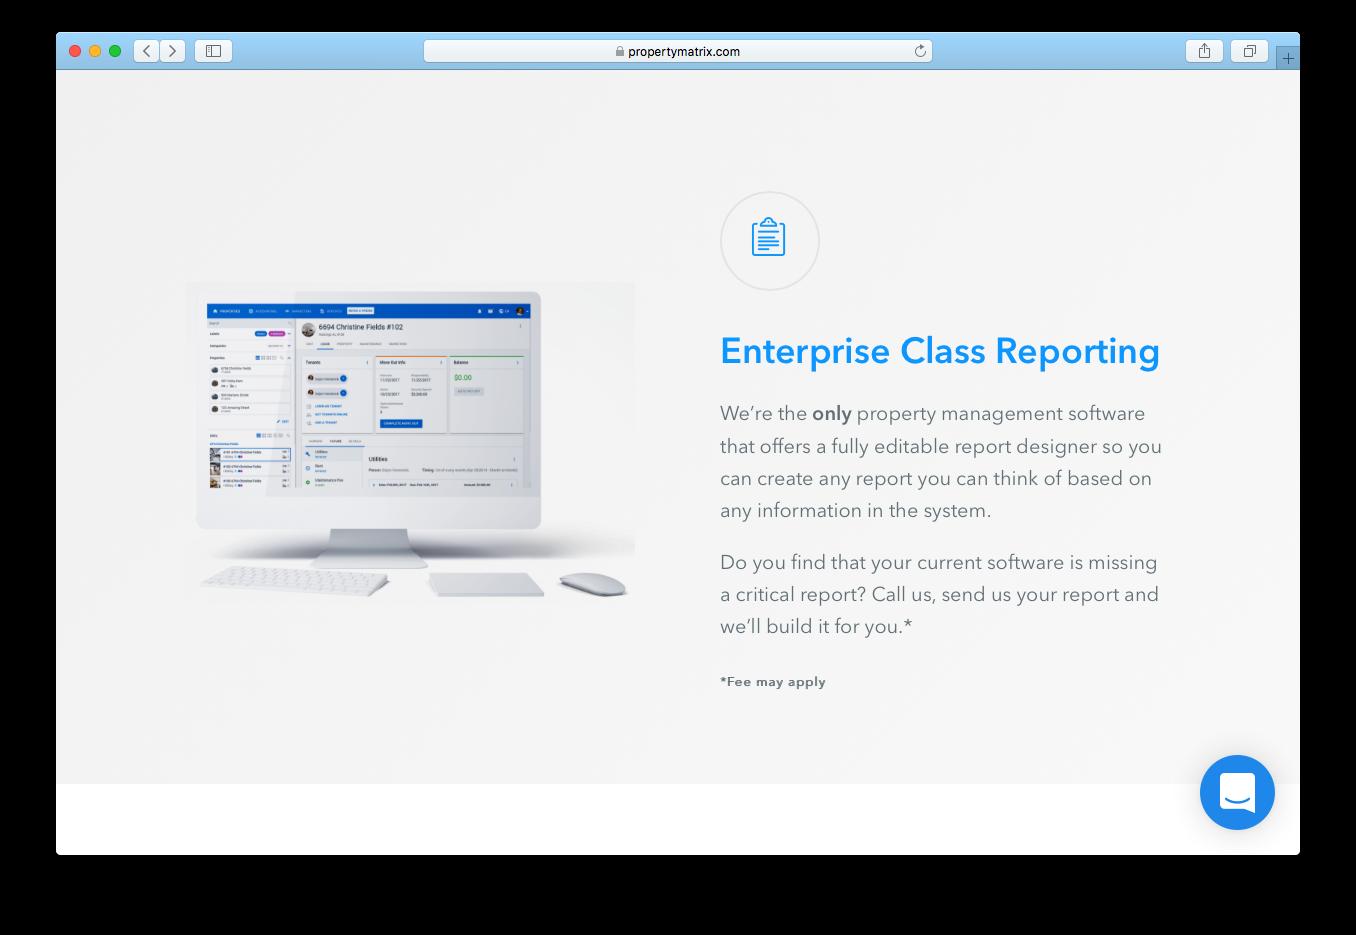 Property Matrix enterprise class reporting property management software designer